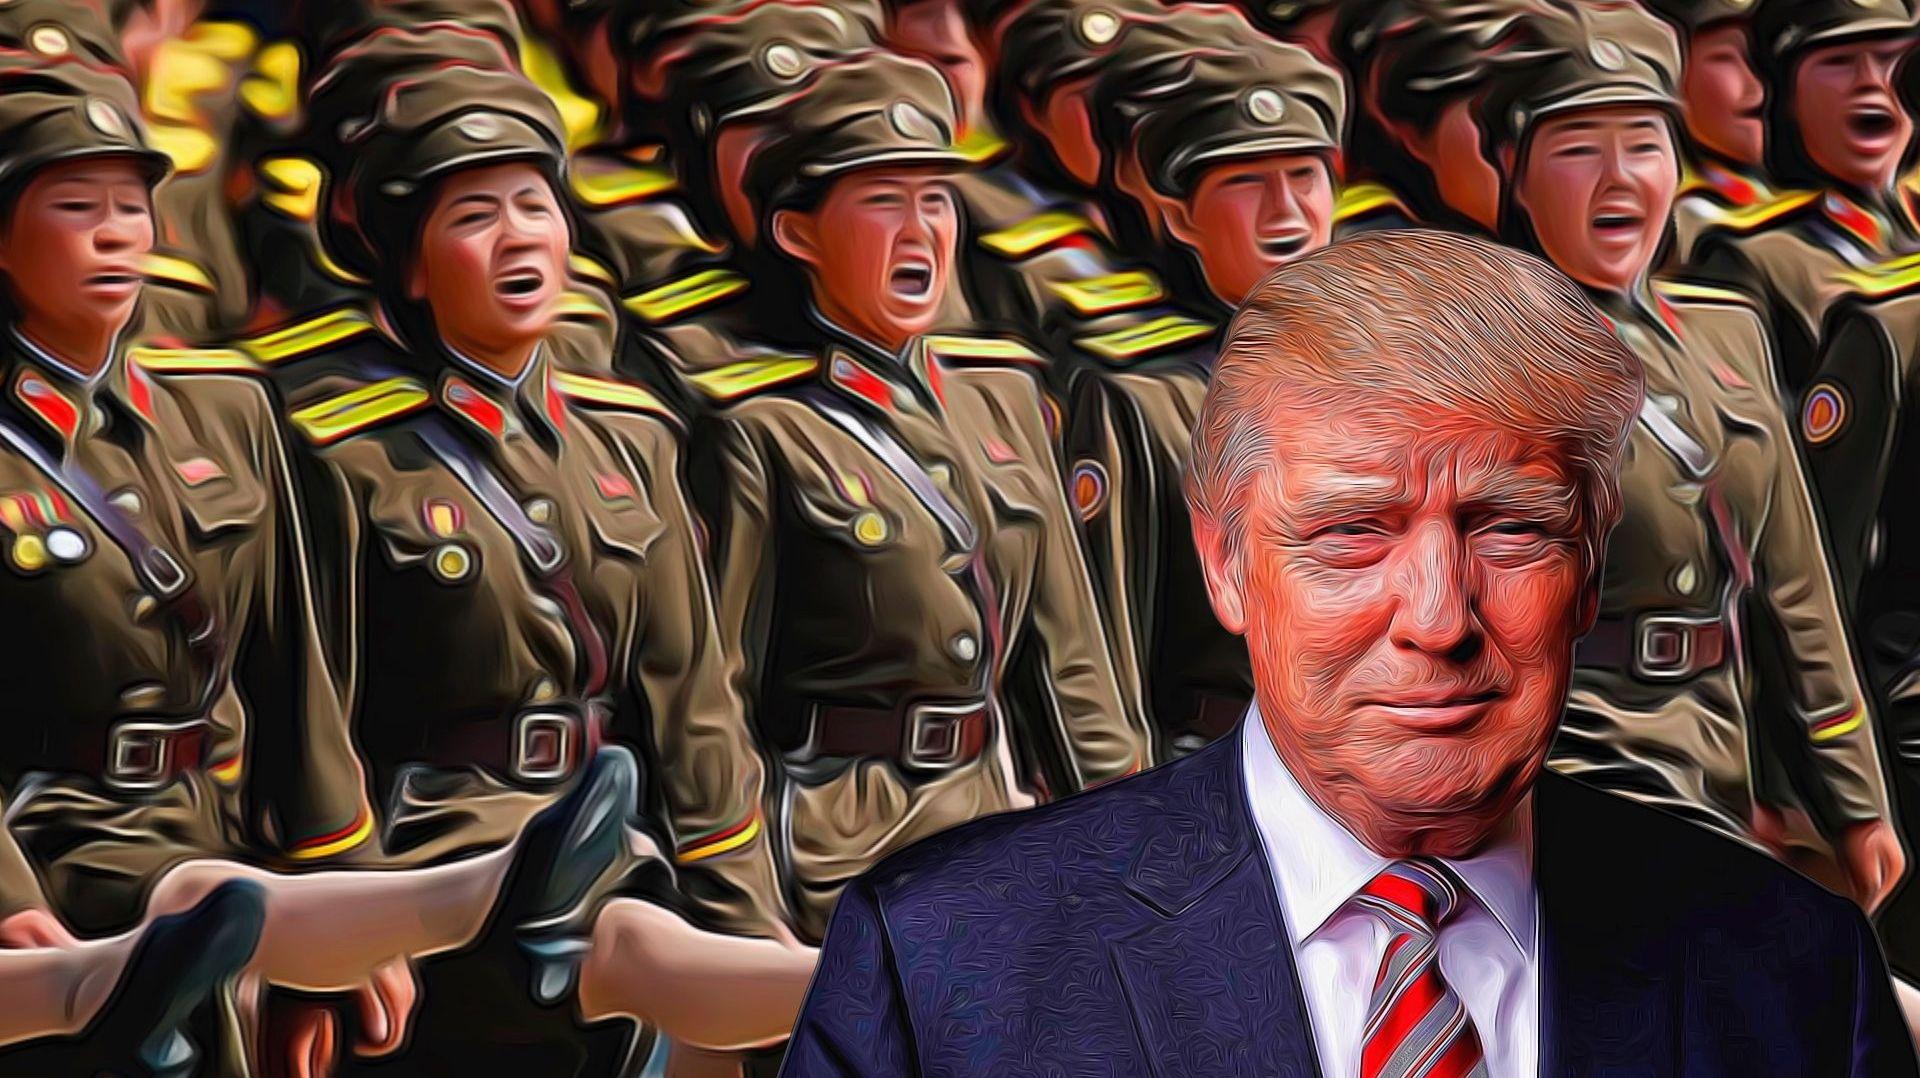 СиЦзиньпин иТрамп обсудили улучшение ситуации вокруг КНДР